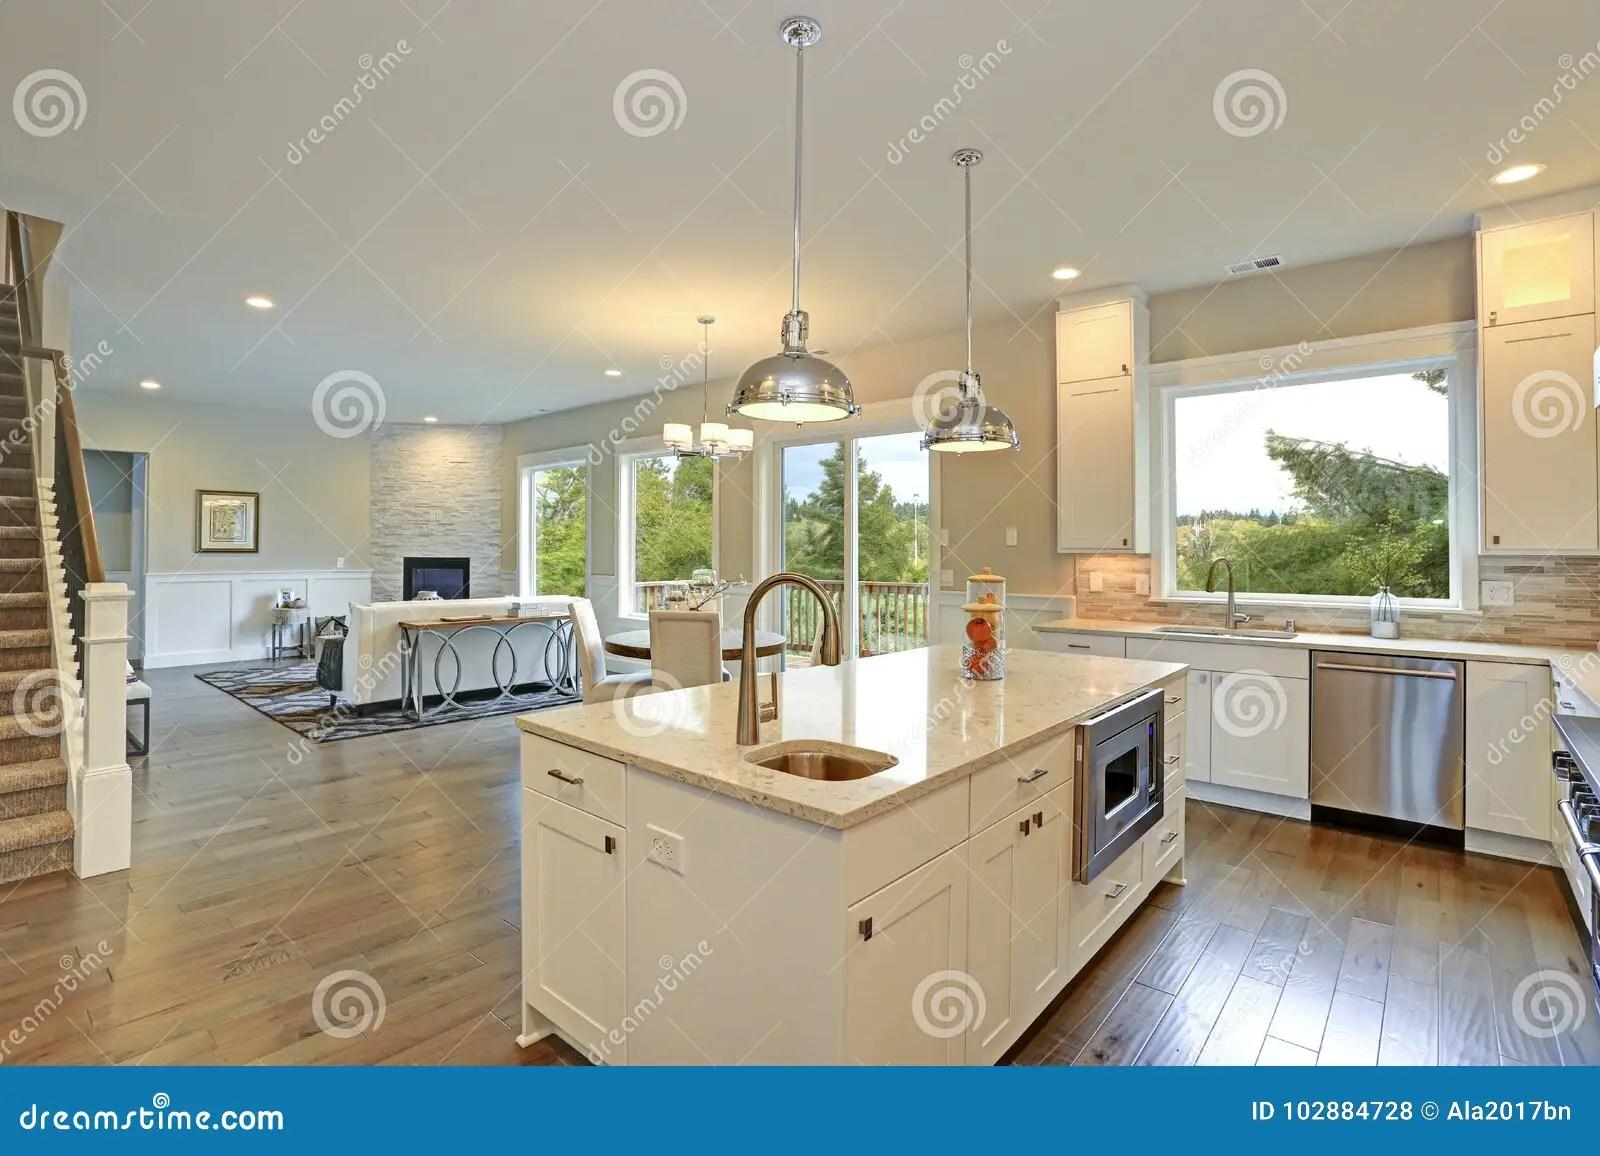 https www dreamstime com amazing white kitchen design shaker cabinets paired gray marble counters large peninsula sink hardwood floors luxury image102884728